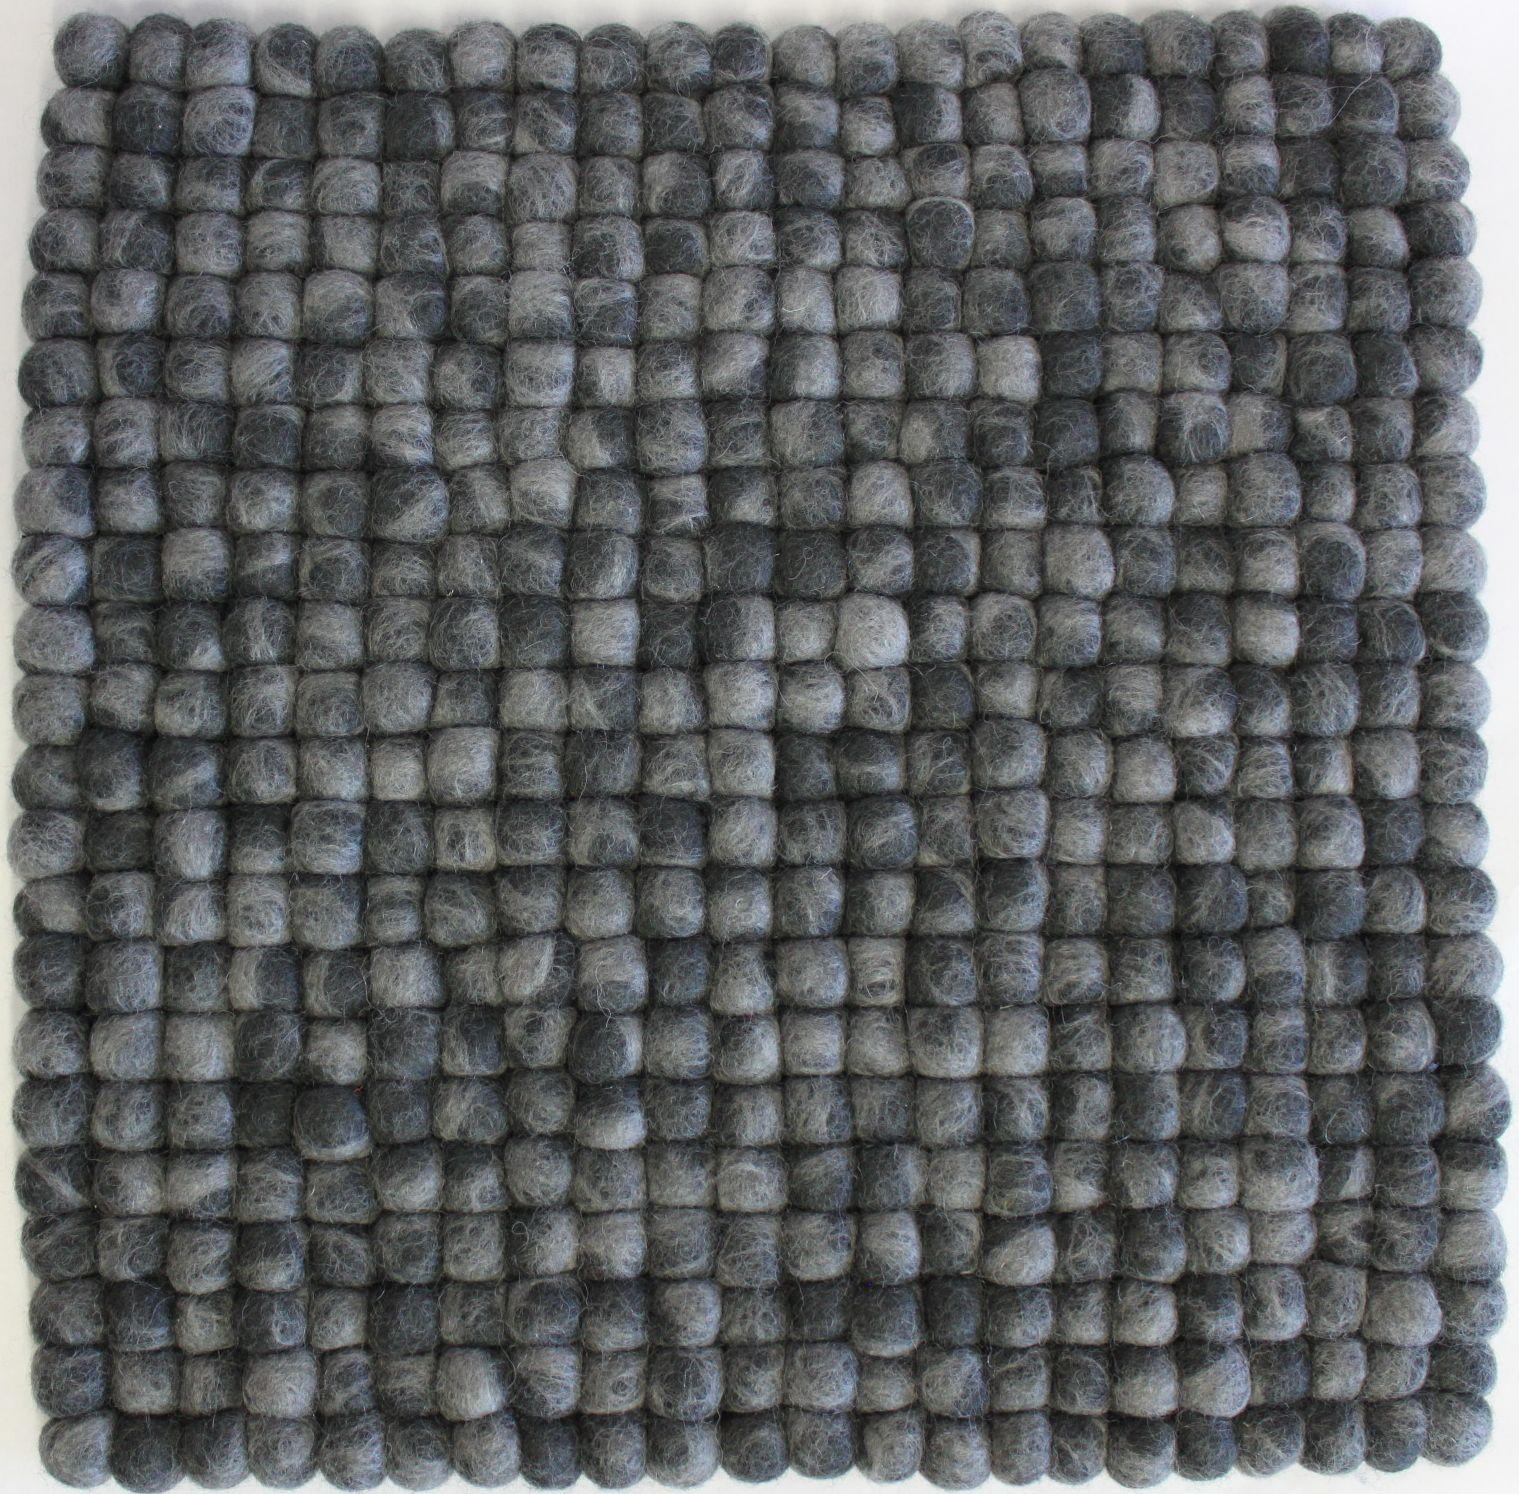 stuhlkissen aus filz 40 x 40 cm dunkel mittelgrau meliert stuhlkissen aus filz produkte. Black Bedroom Furniture Sets. Home Design Ideas